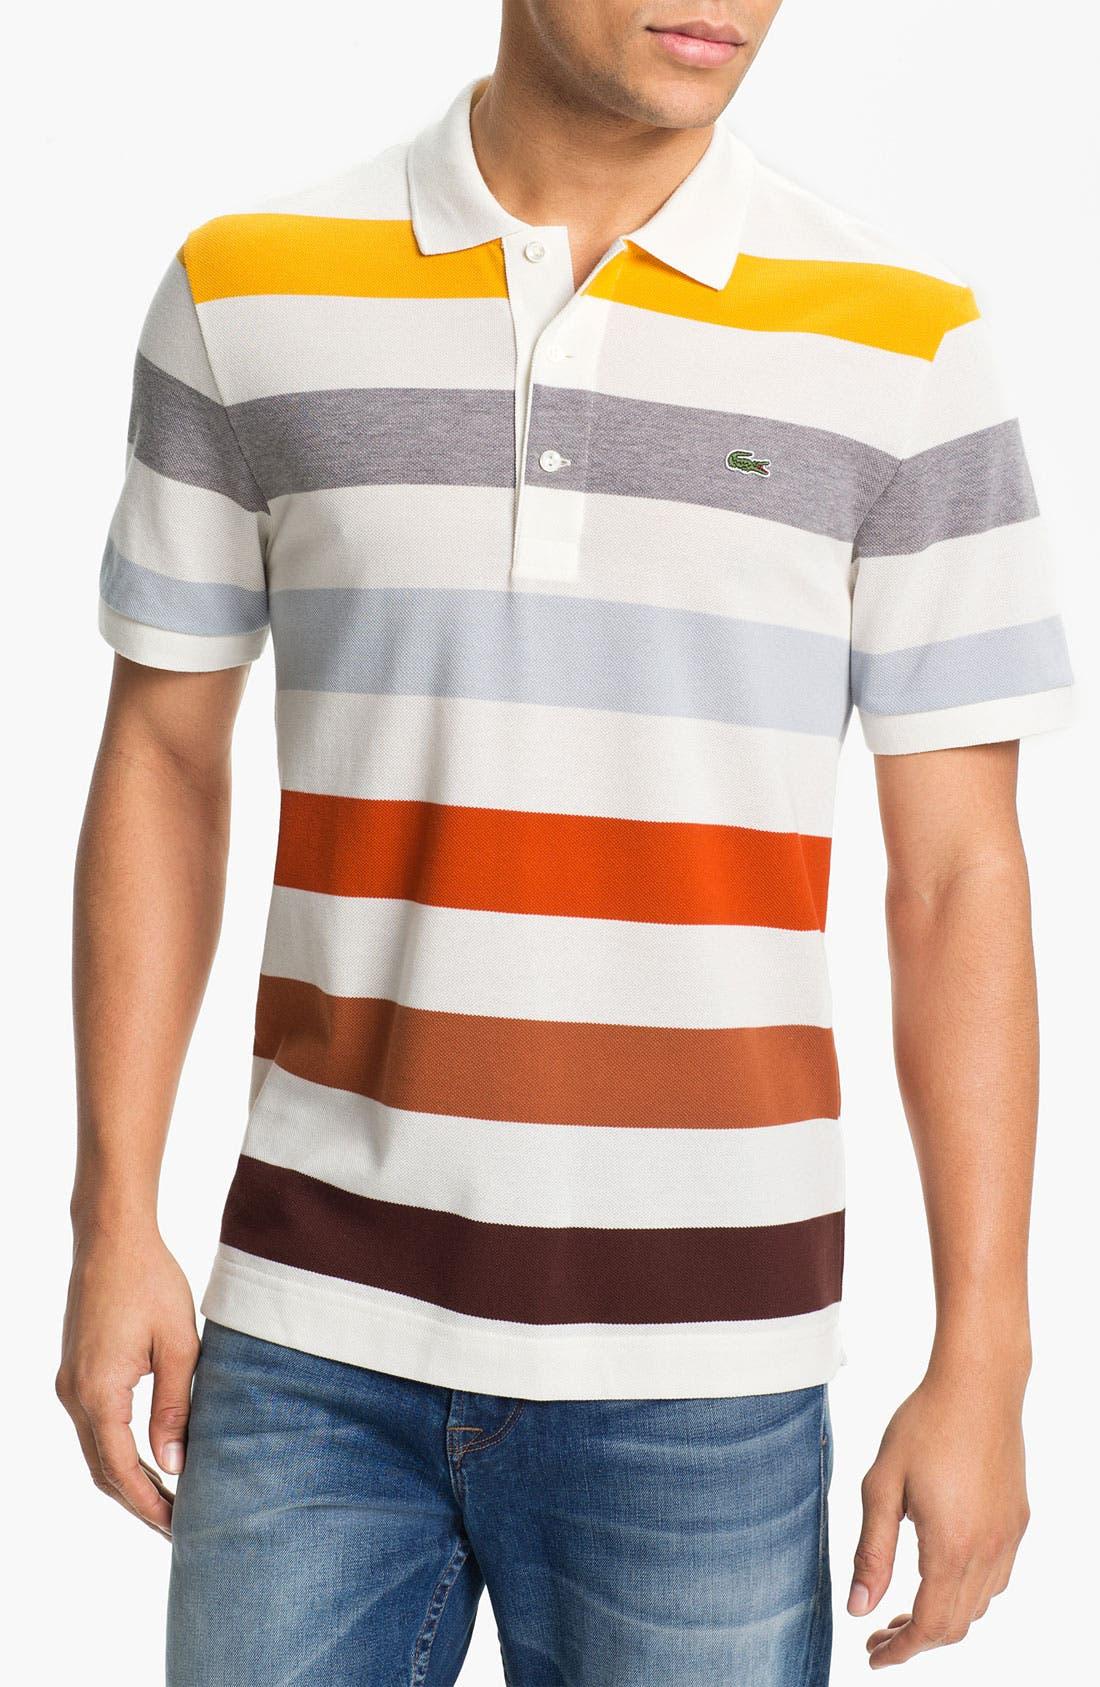 Alternate Image 1 Selected - Lacoste Bar Stripe Piqué Polo